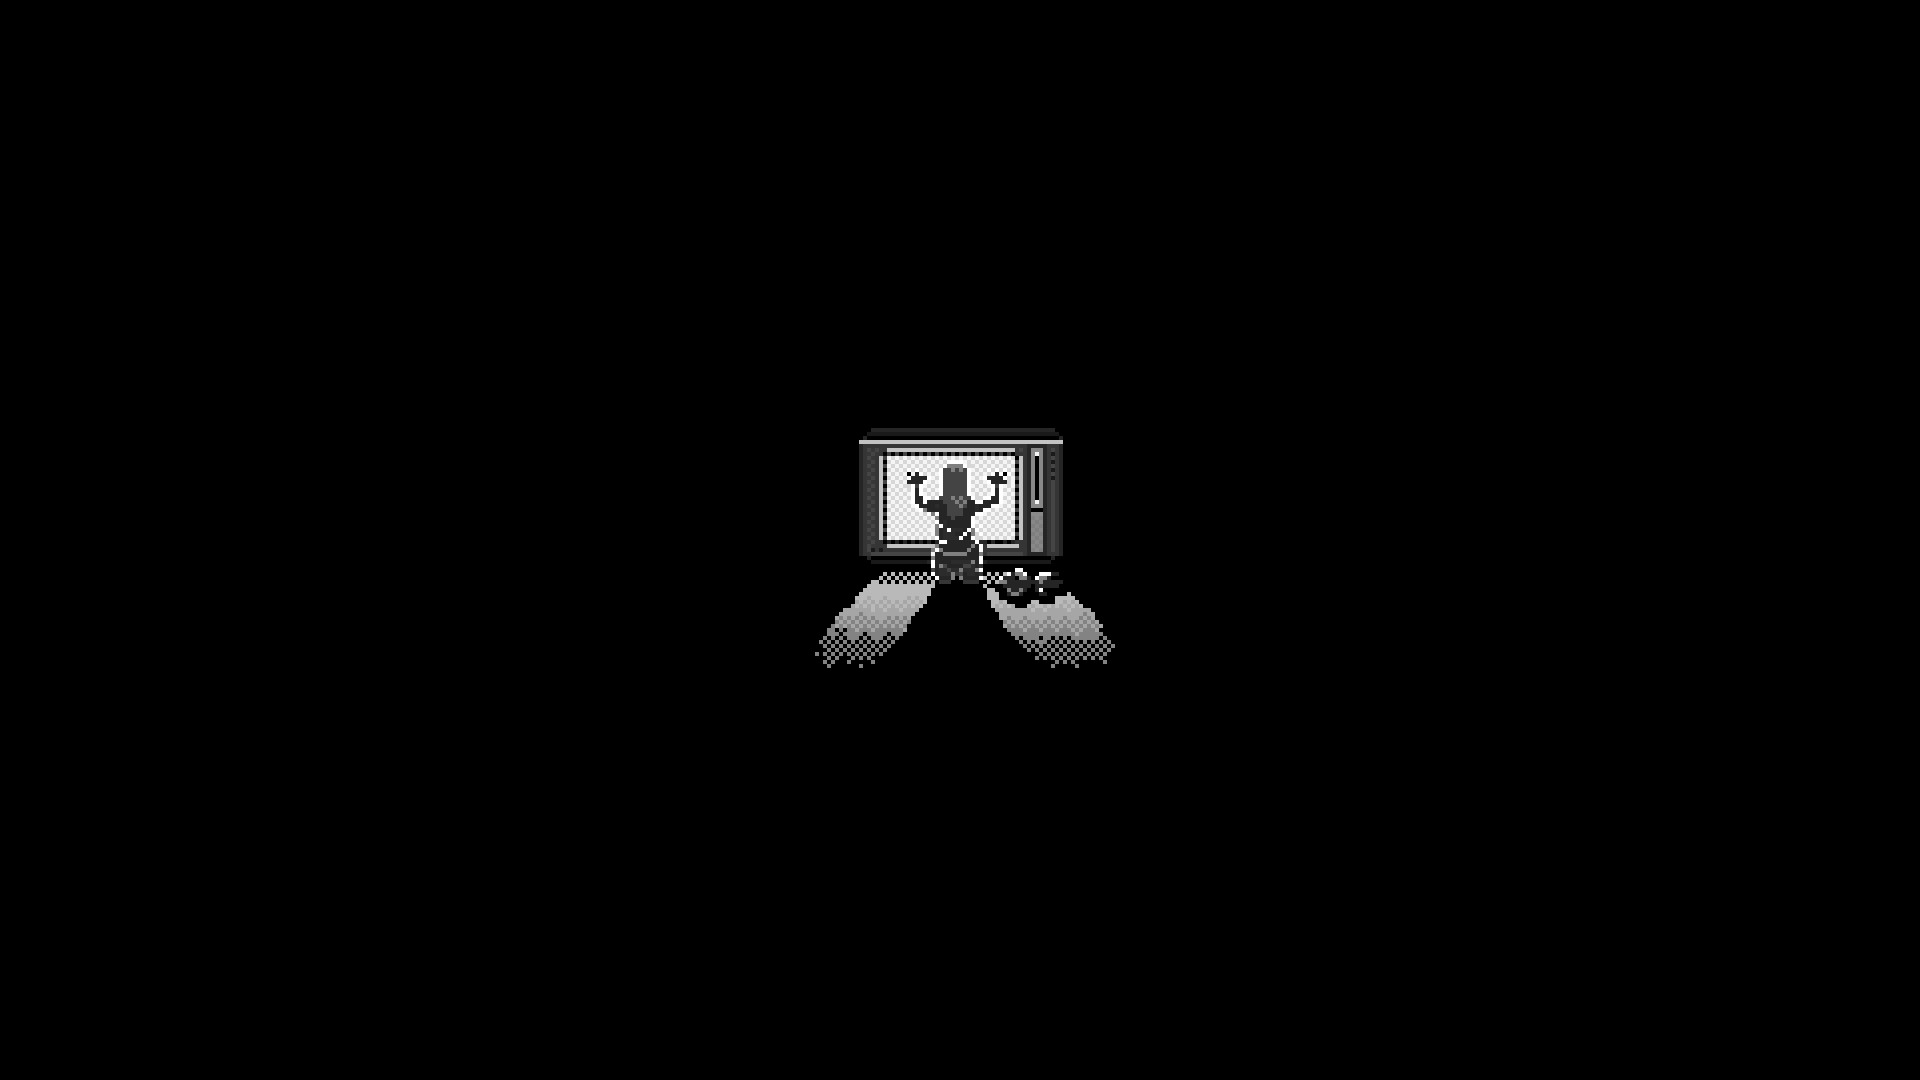 Usa Anime Gun Girl Wallpaper 1920x1080 400x150 Pixel Images Wallpaper 77 Images